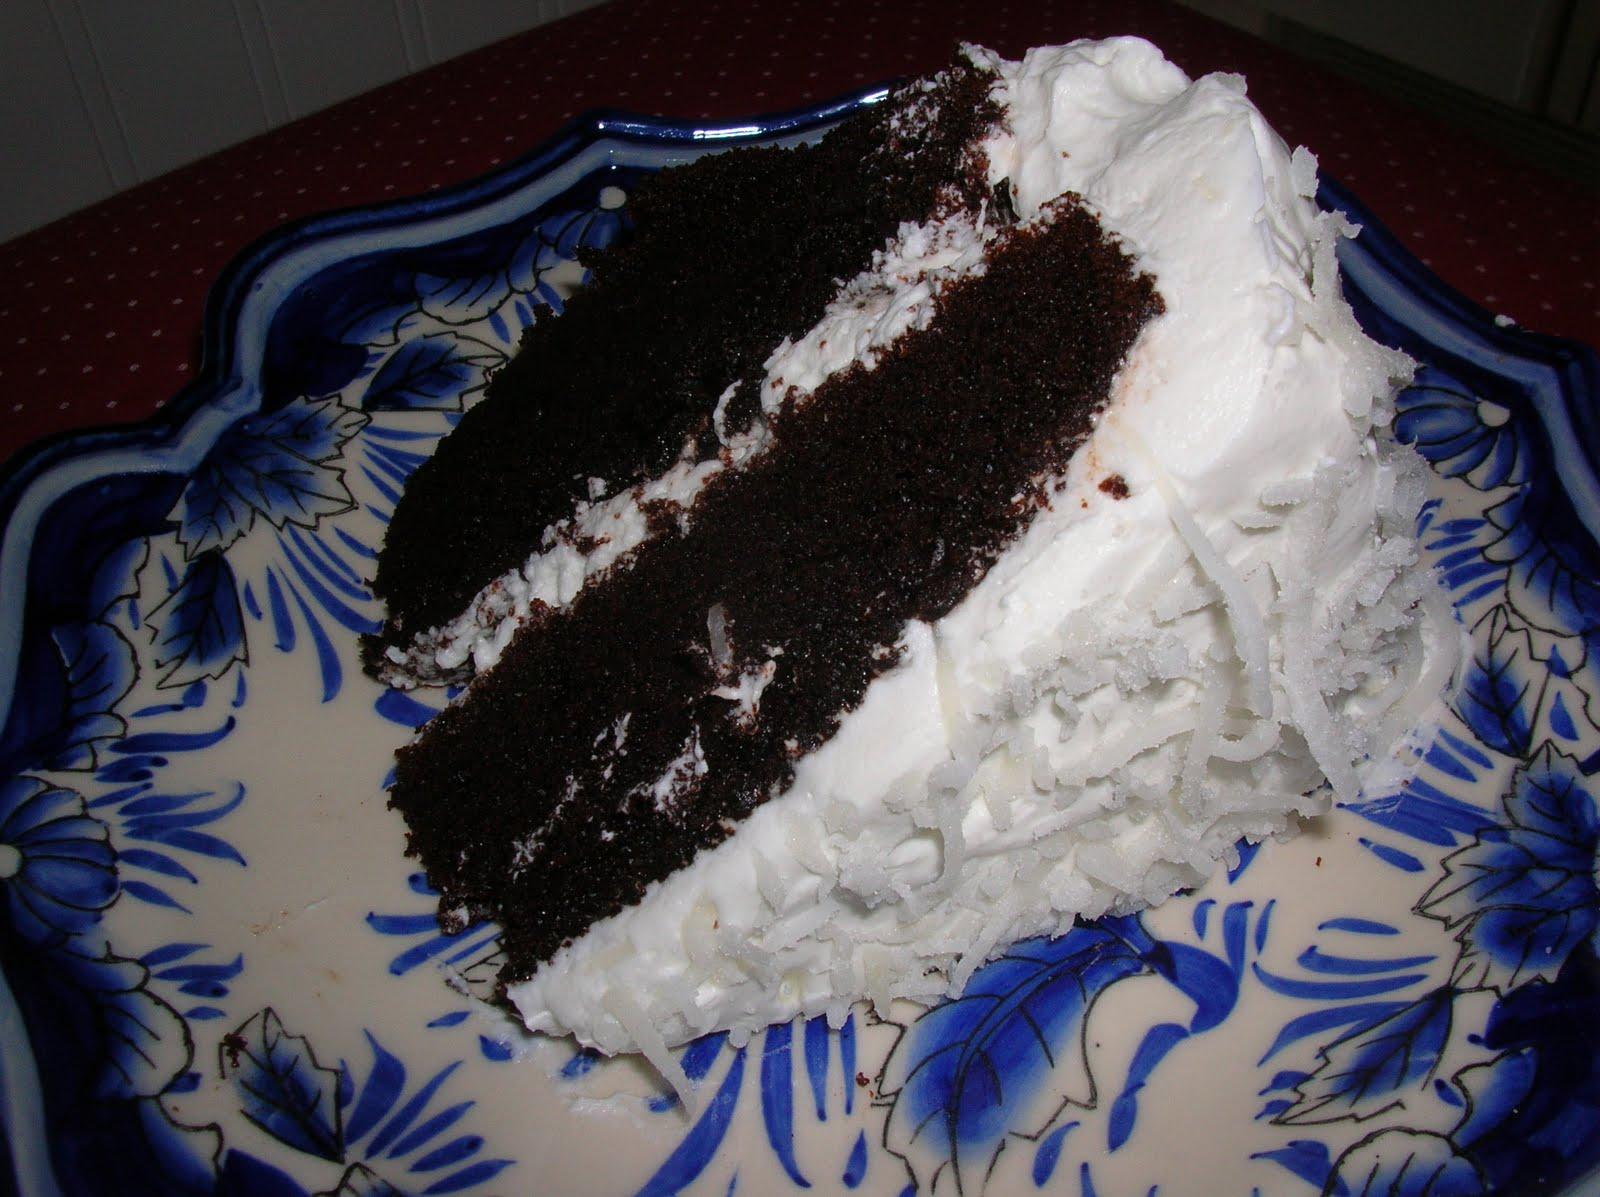 Year of Cakes: Cake Recipe #2 - Chocolate Cake with Coconut Cream